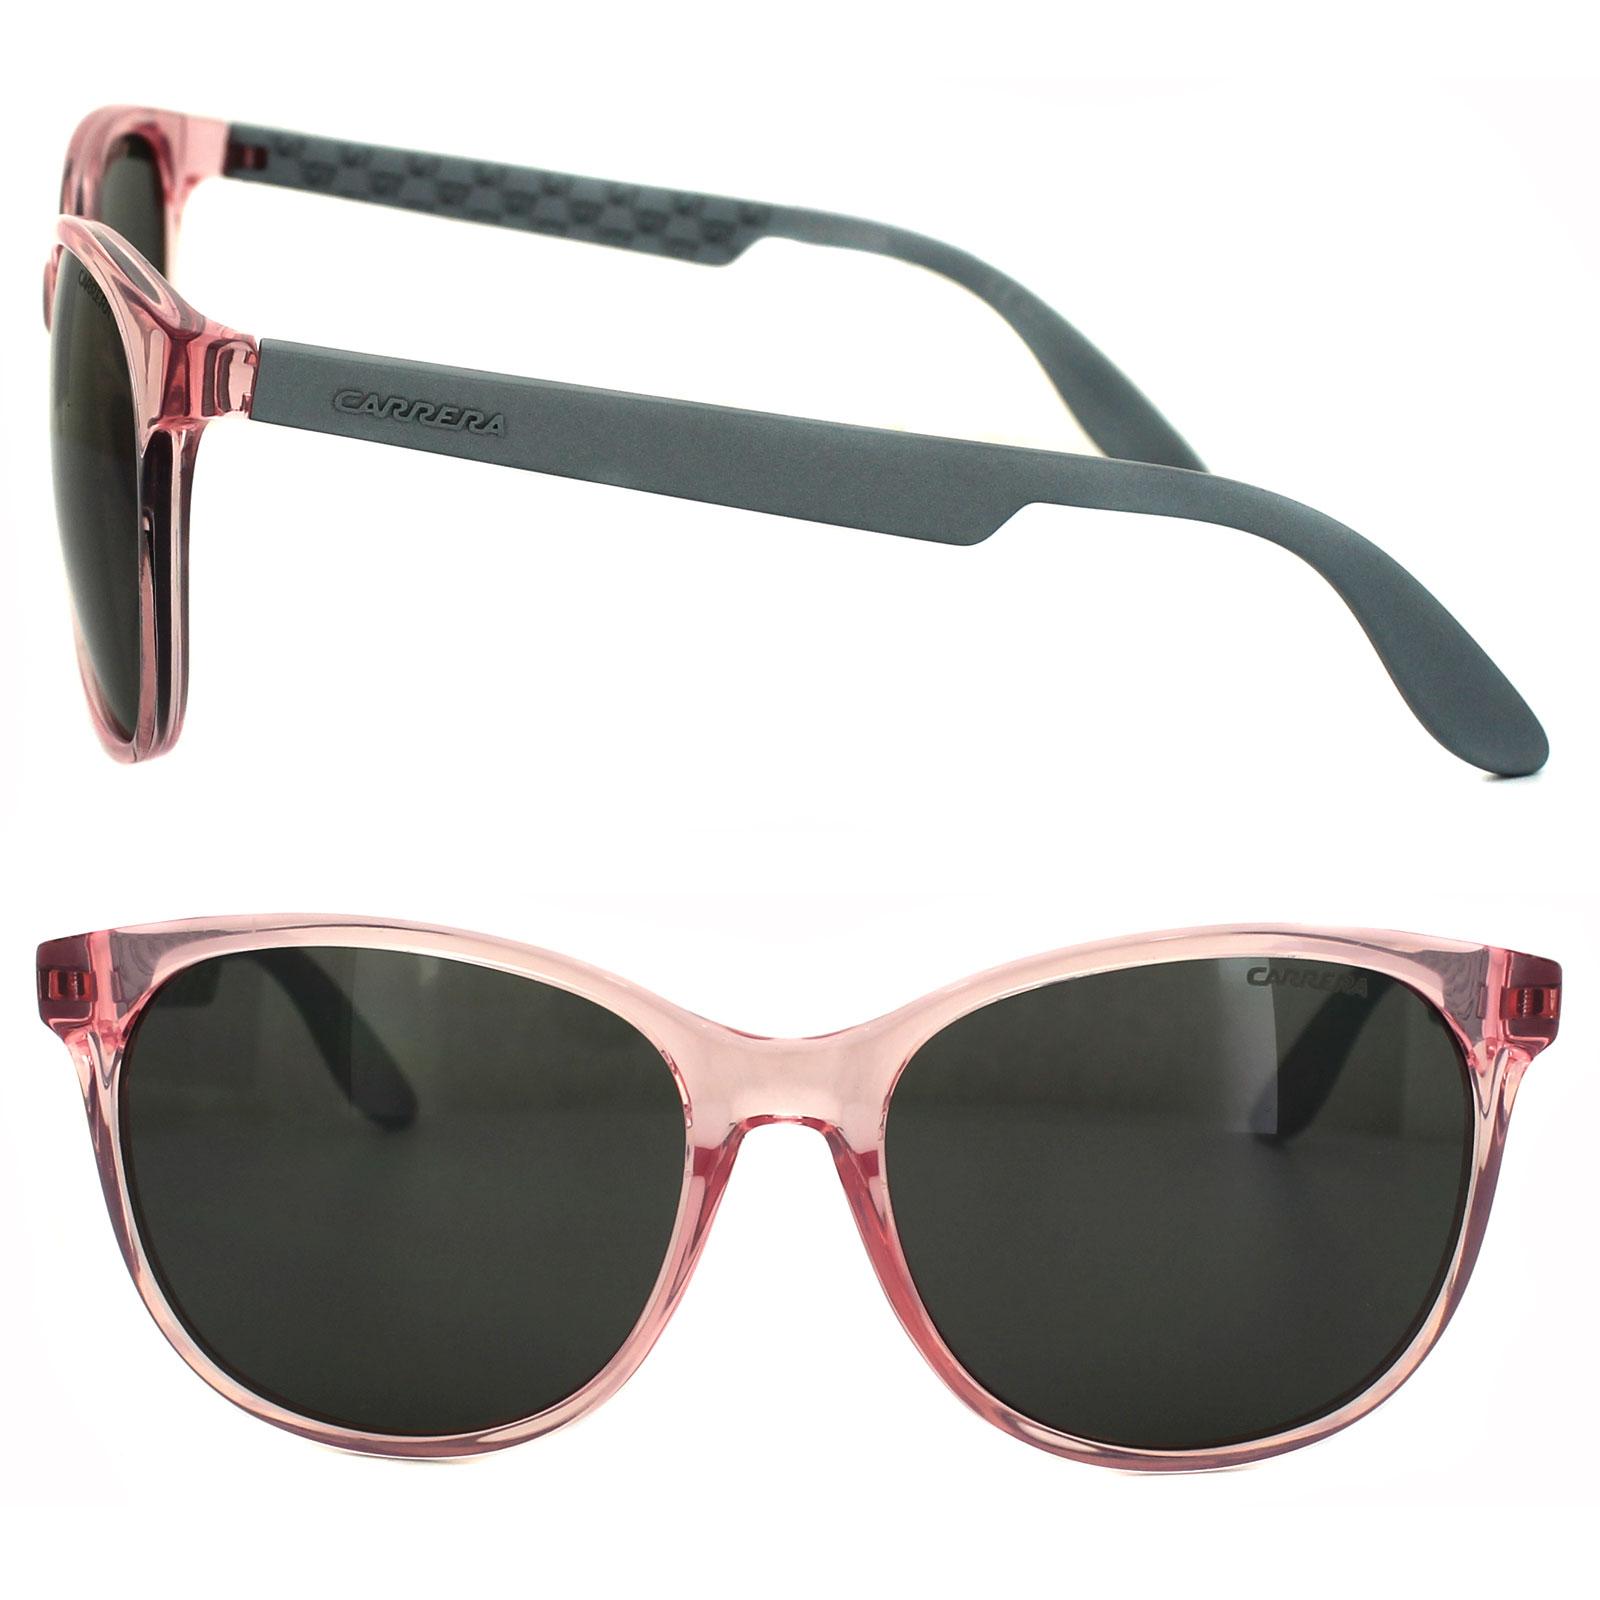 Cheap Carrera Carrera 5001 Sunglasses Discounted Sunglasses